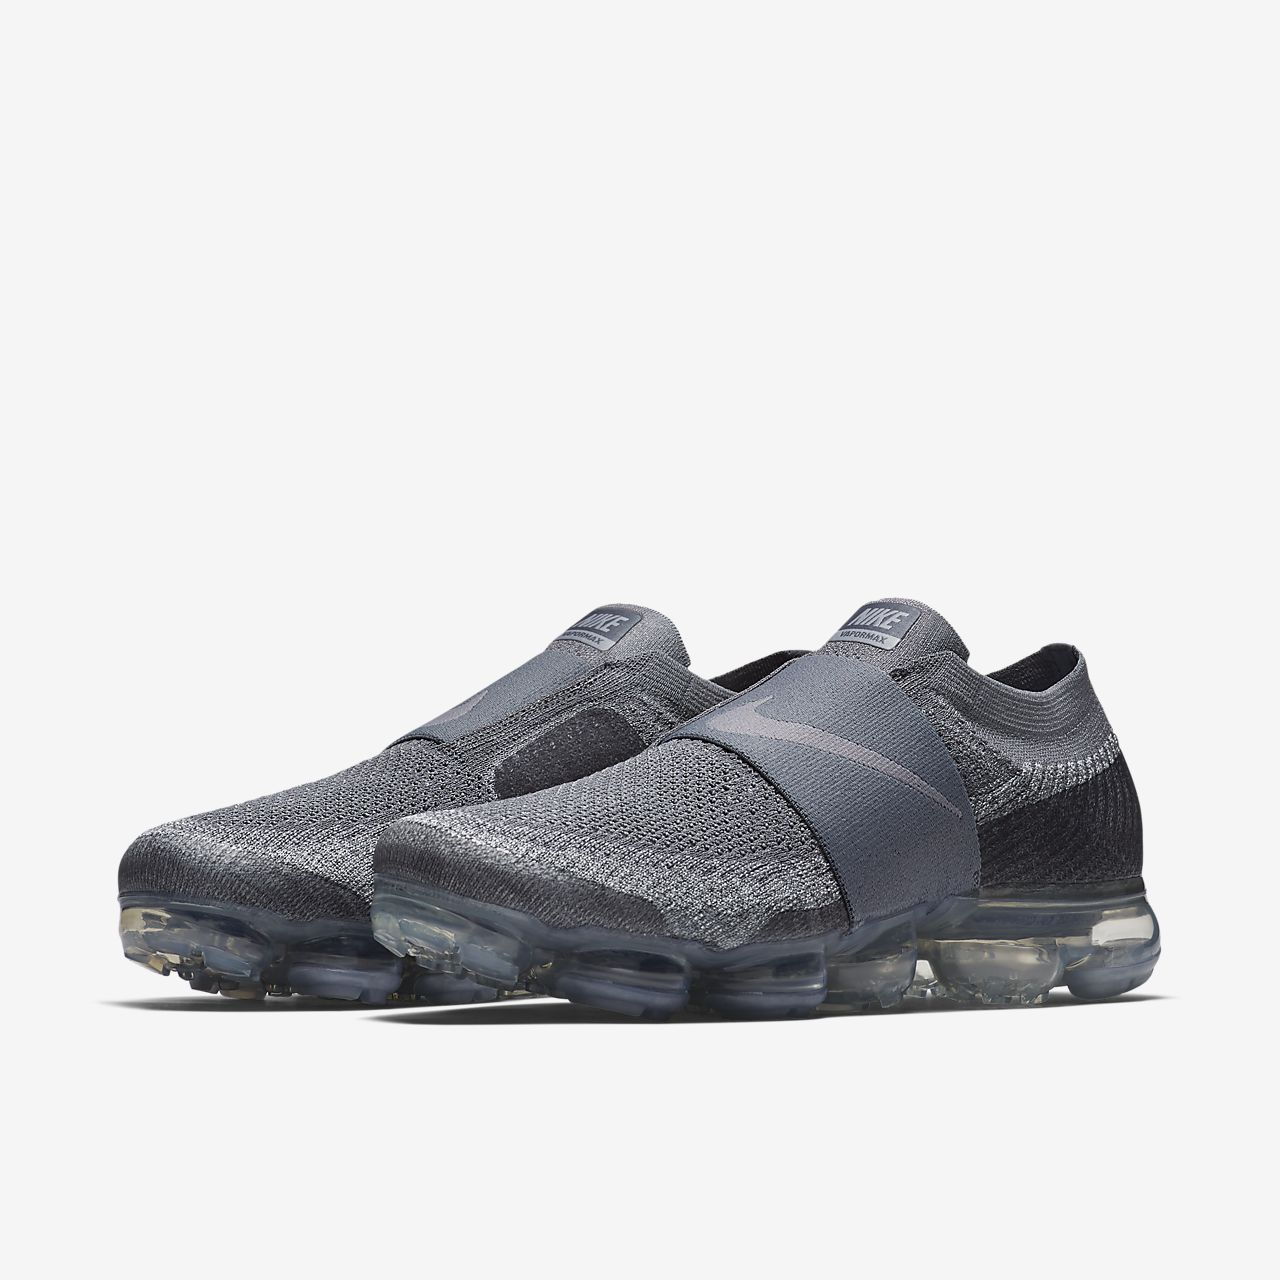 scarpe vapormax nike